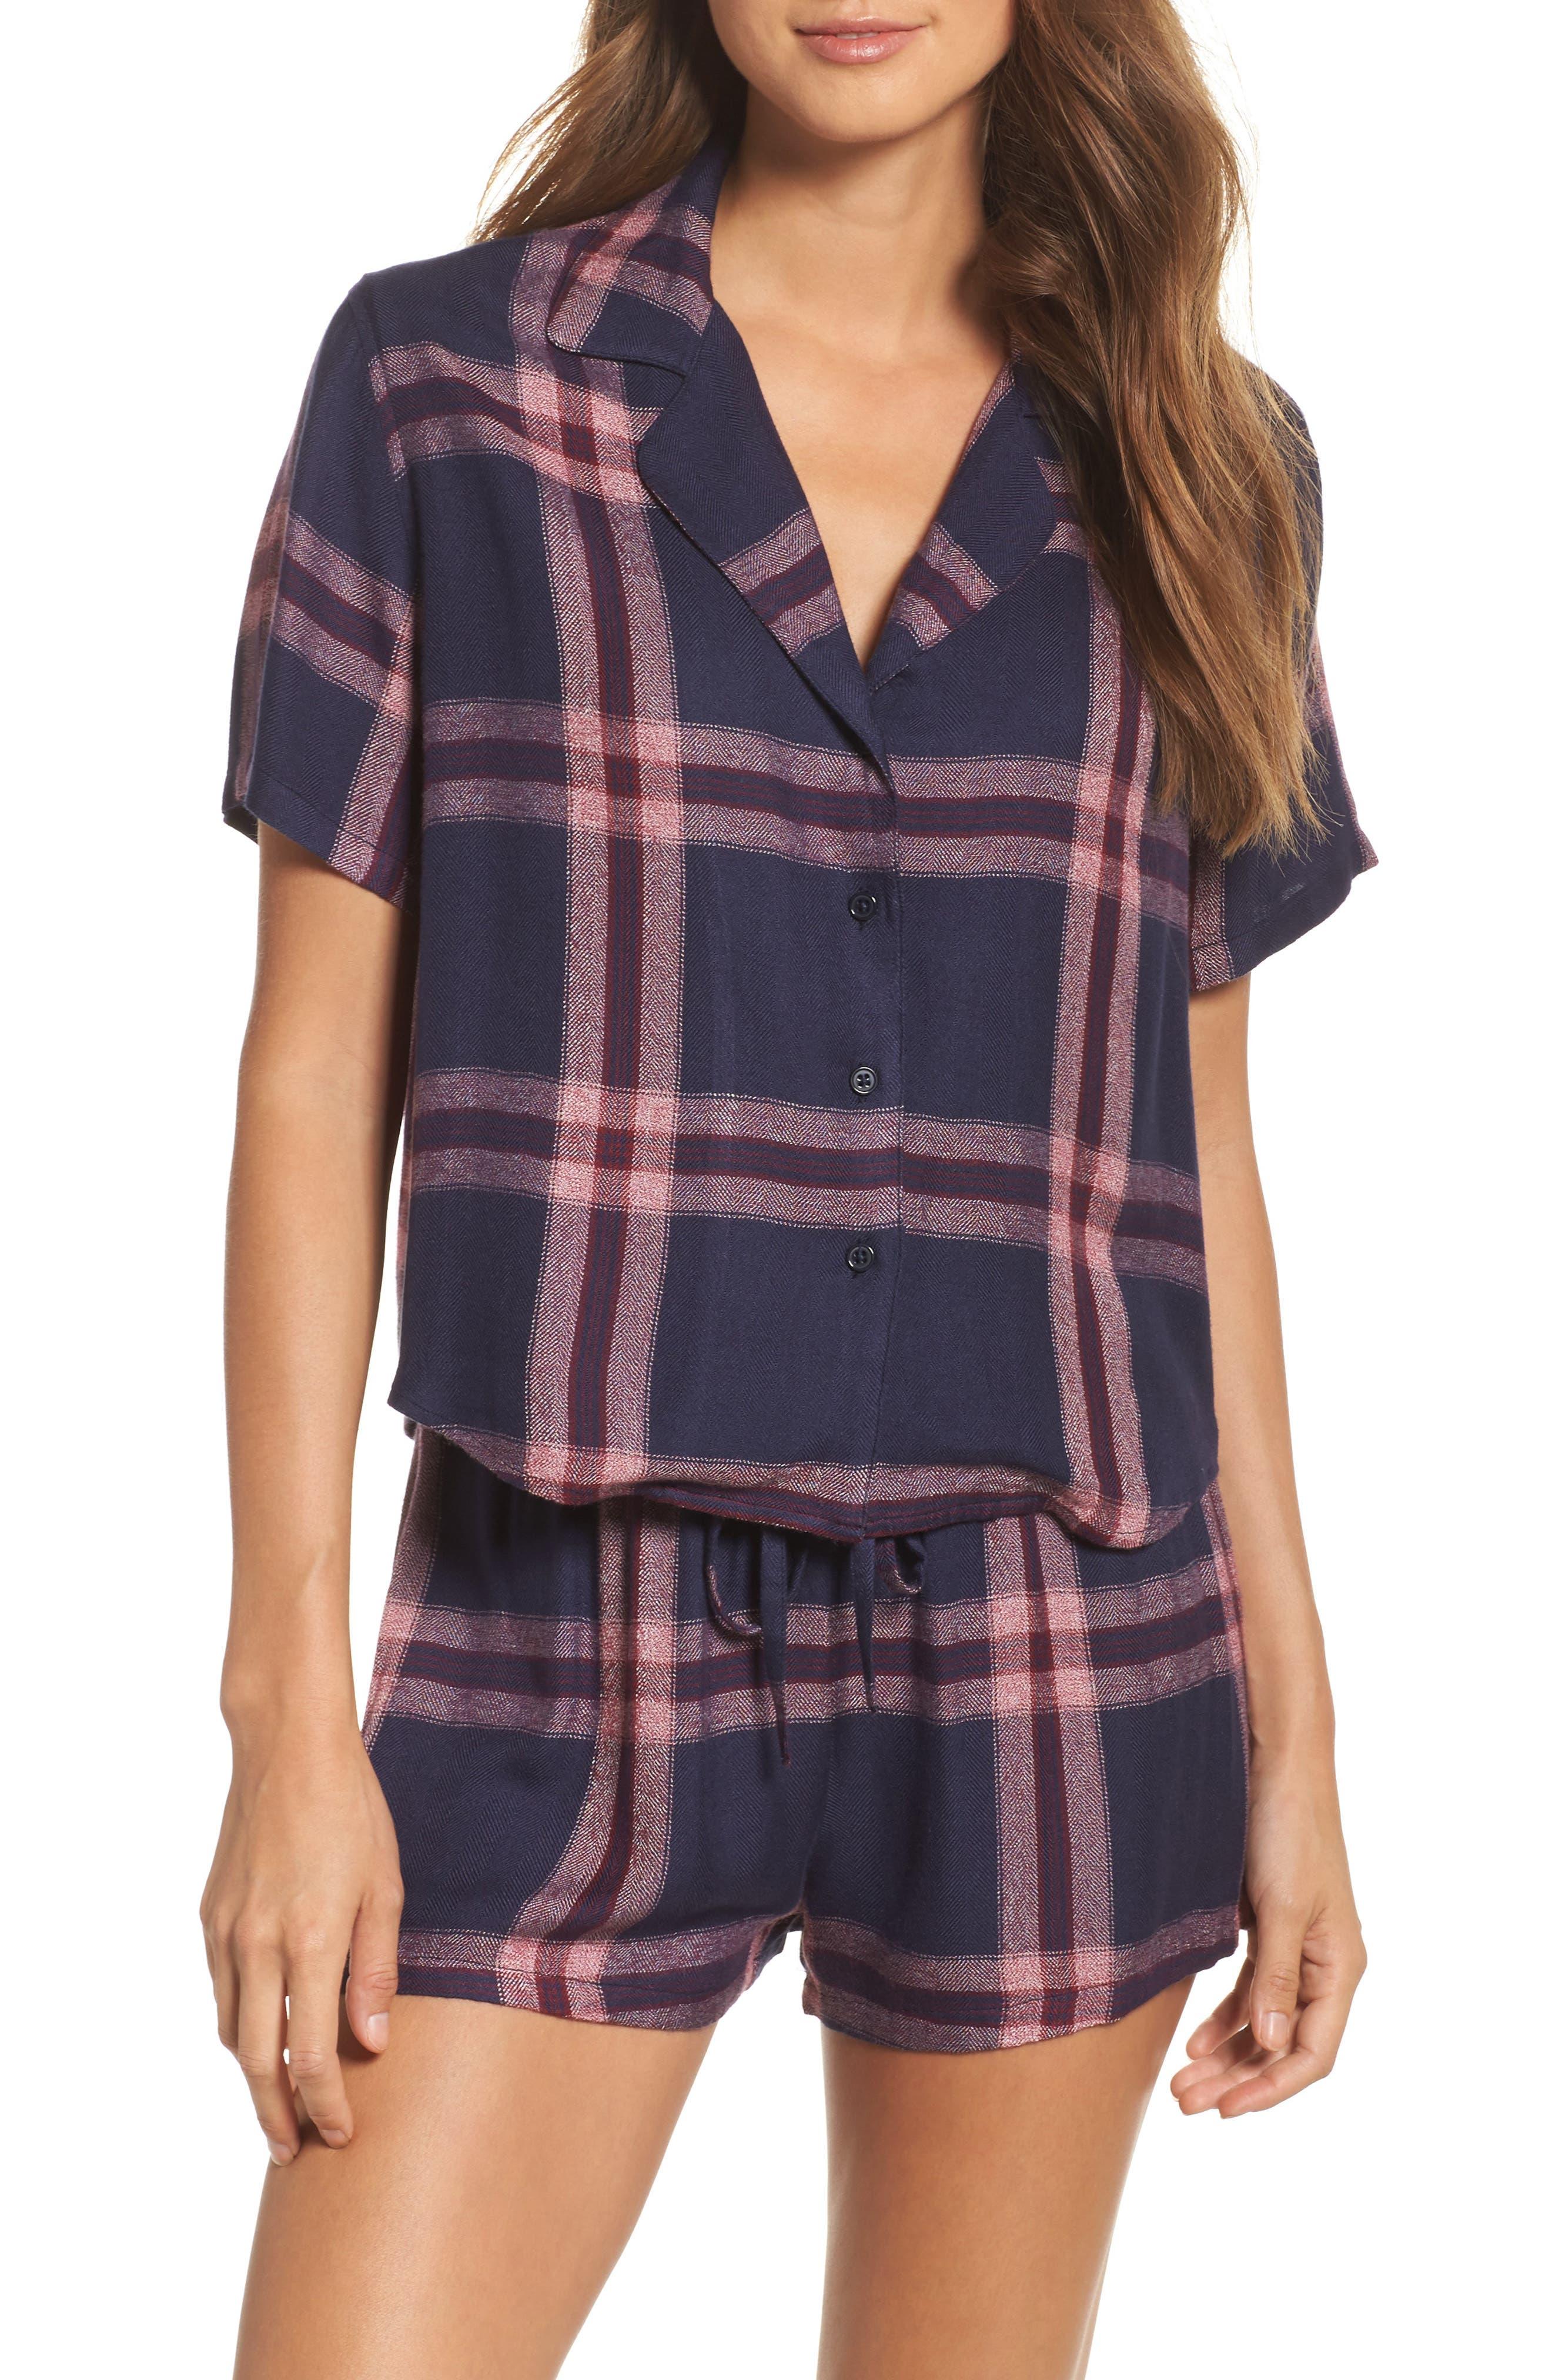 Alternate Image 1 Selected - Rails Plaid Short Pajamas